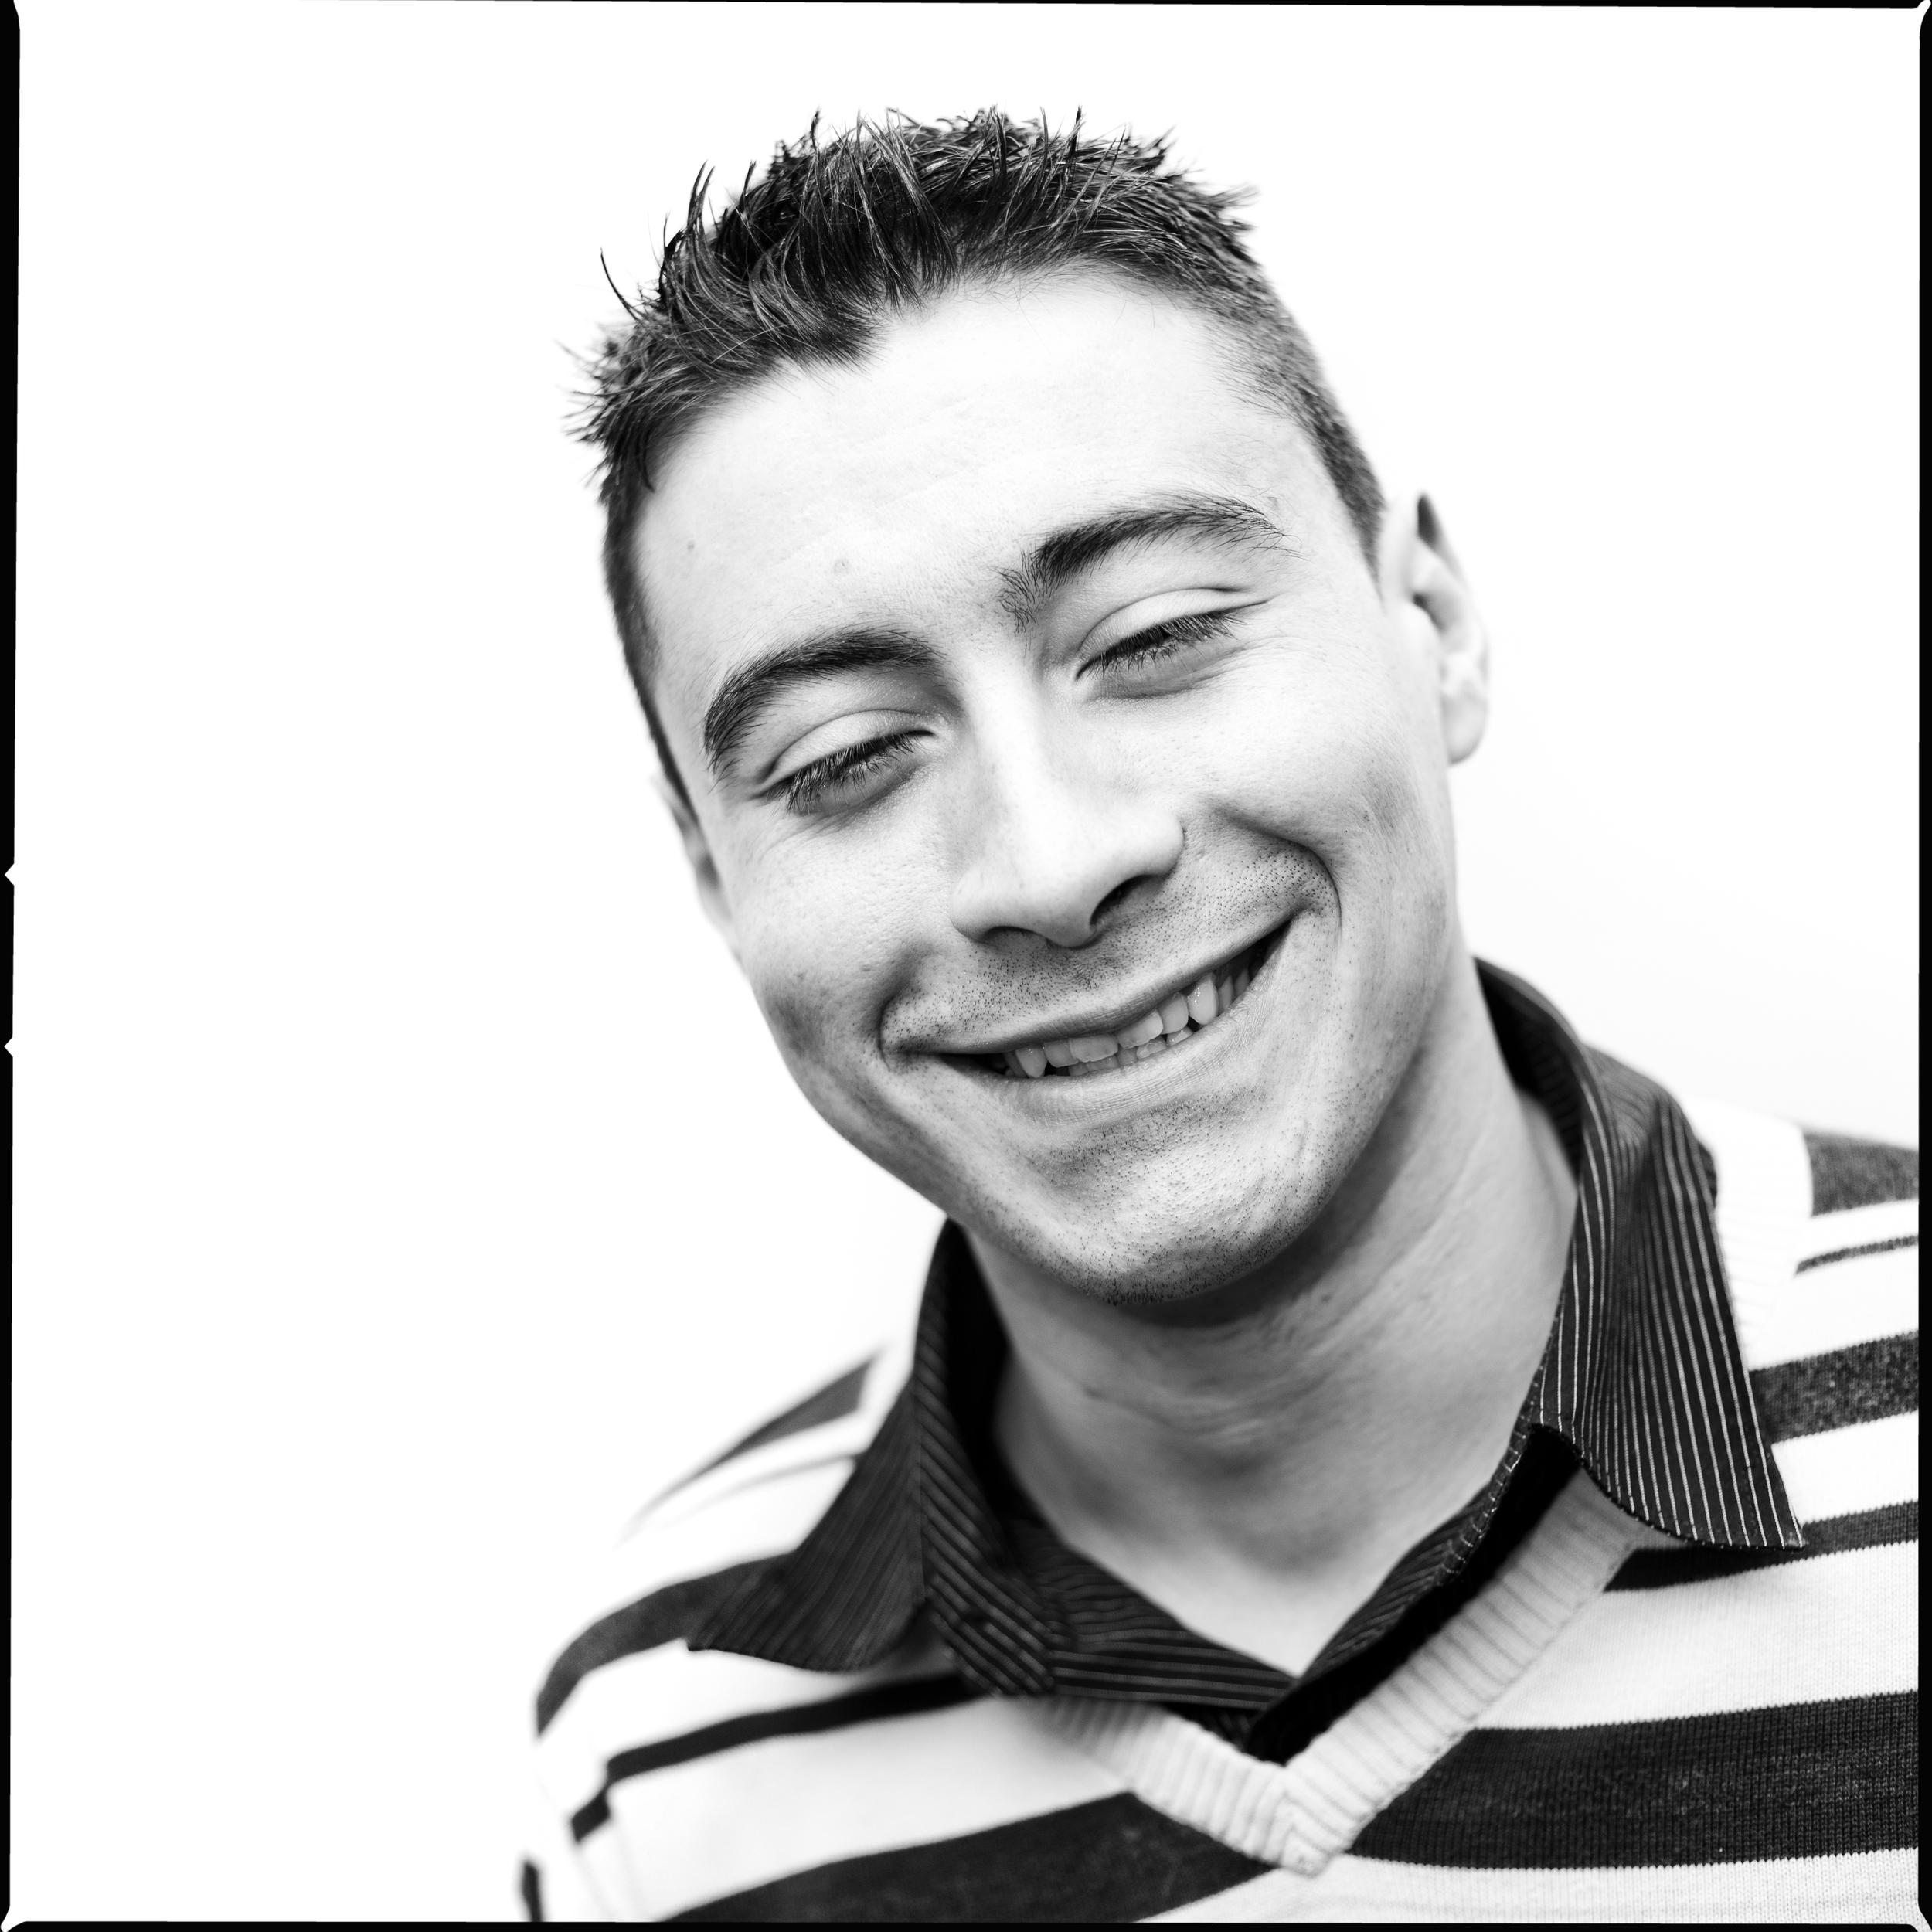 Oscar_Arribas_Portrait_photography_retrato_editorial_project_fotografia_studio_02.jpg